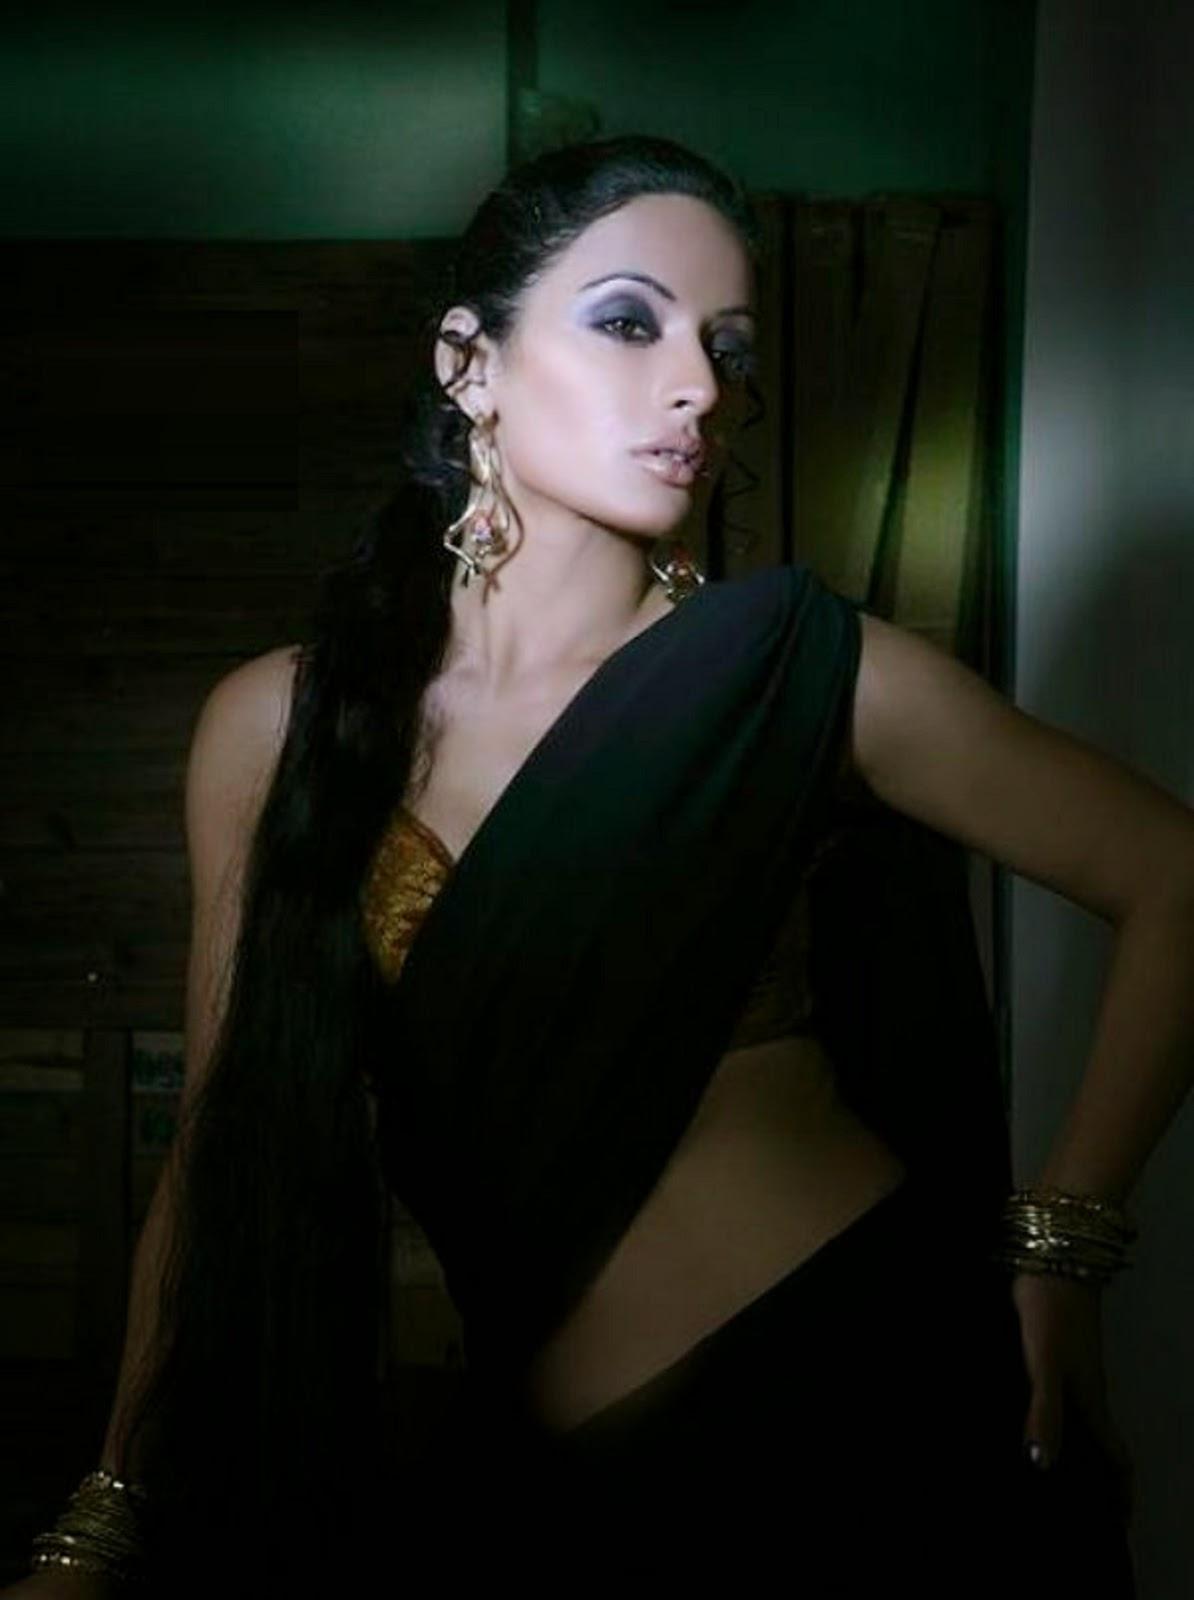 Soni Singh Wallpapers Free Download